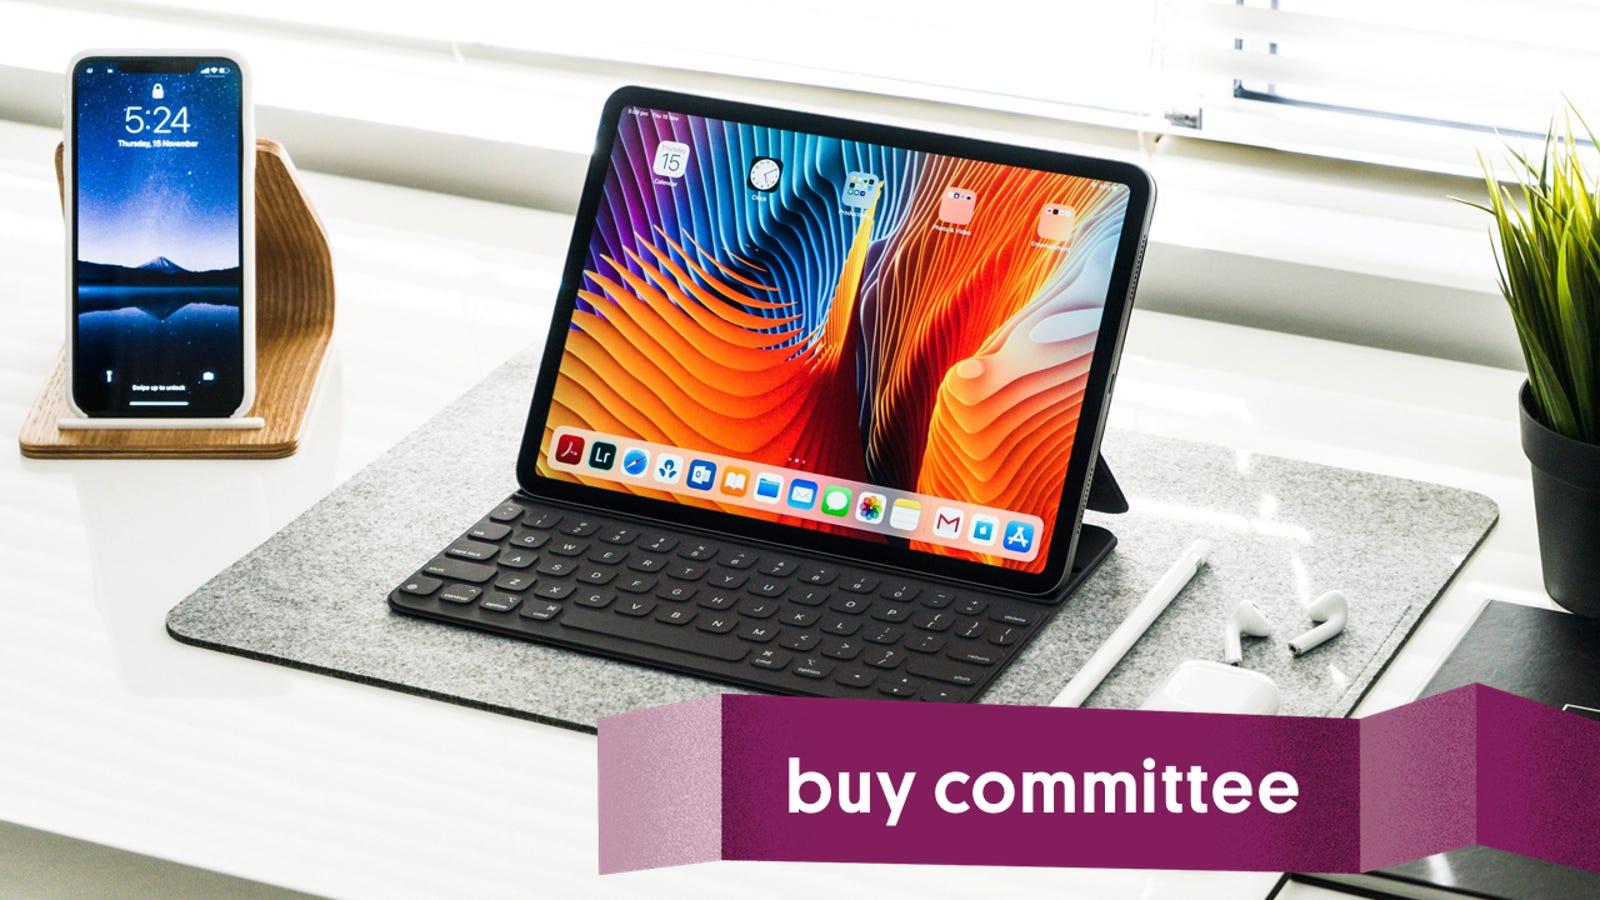 What Keyboard Workstation Should I Buy : buy committee should i buy a keyboard for my ipad ~ Russianpoet.info Haus und Dekorationen